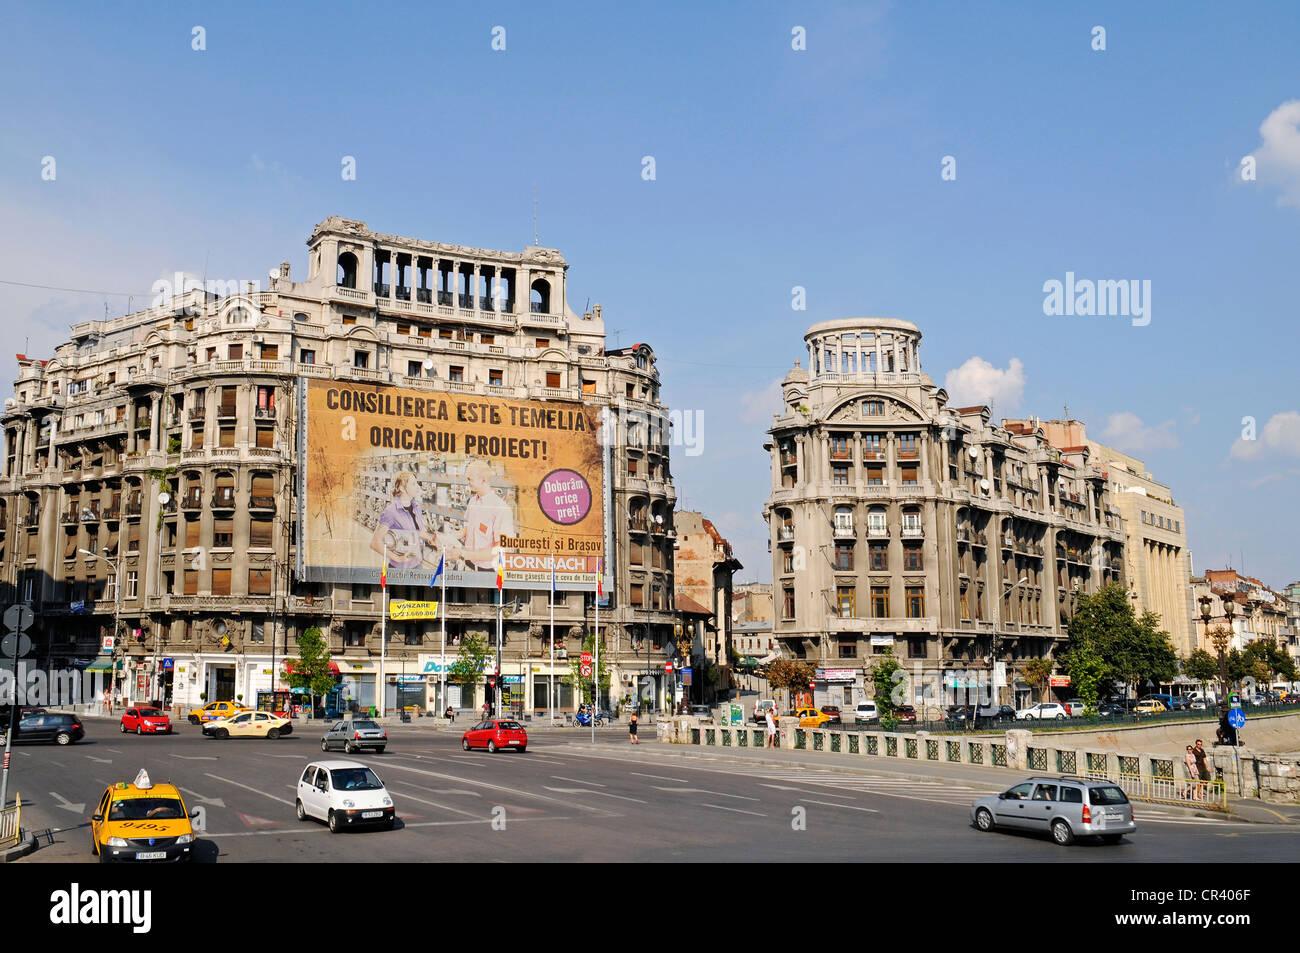 Multistorey buildings, billboard, street scene, Piata Natiunile Unite square, Bucharest, Romania, Eastern Europe, - Stock Image